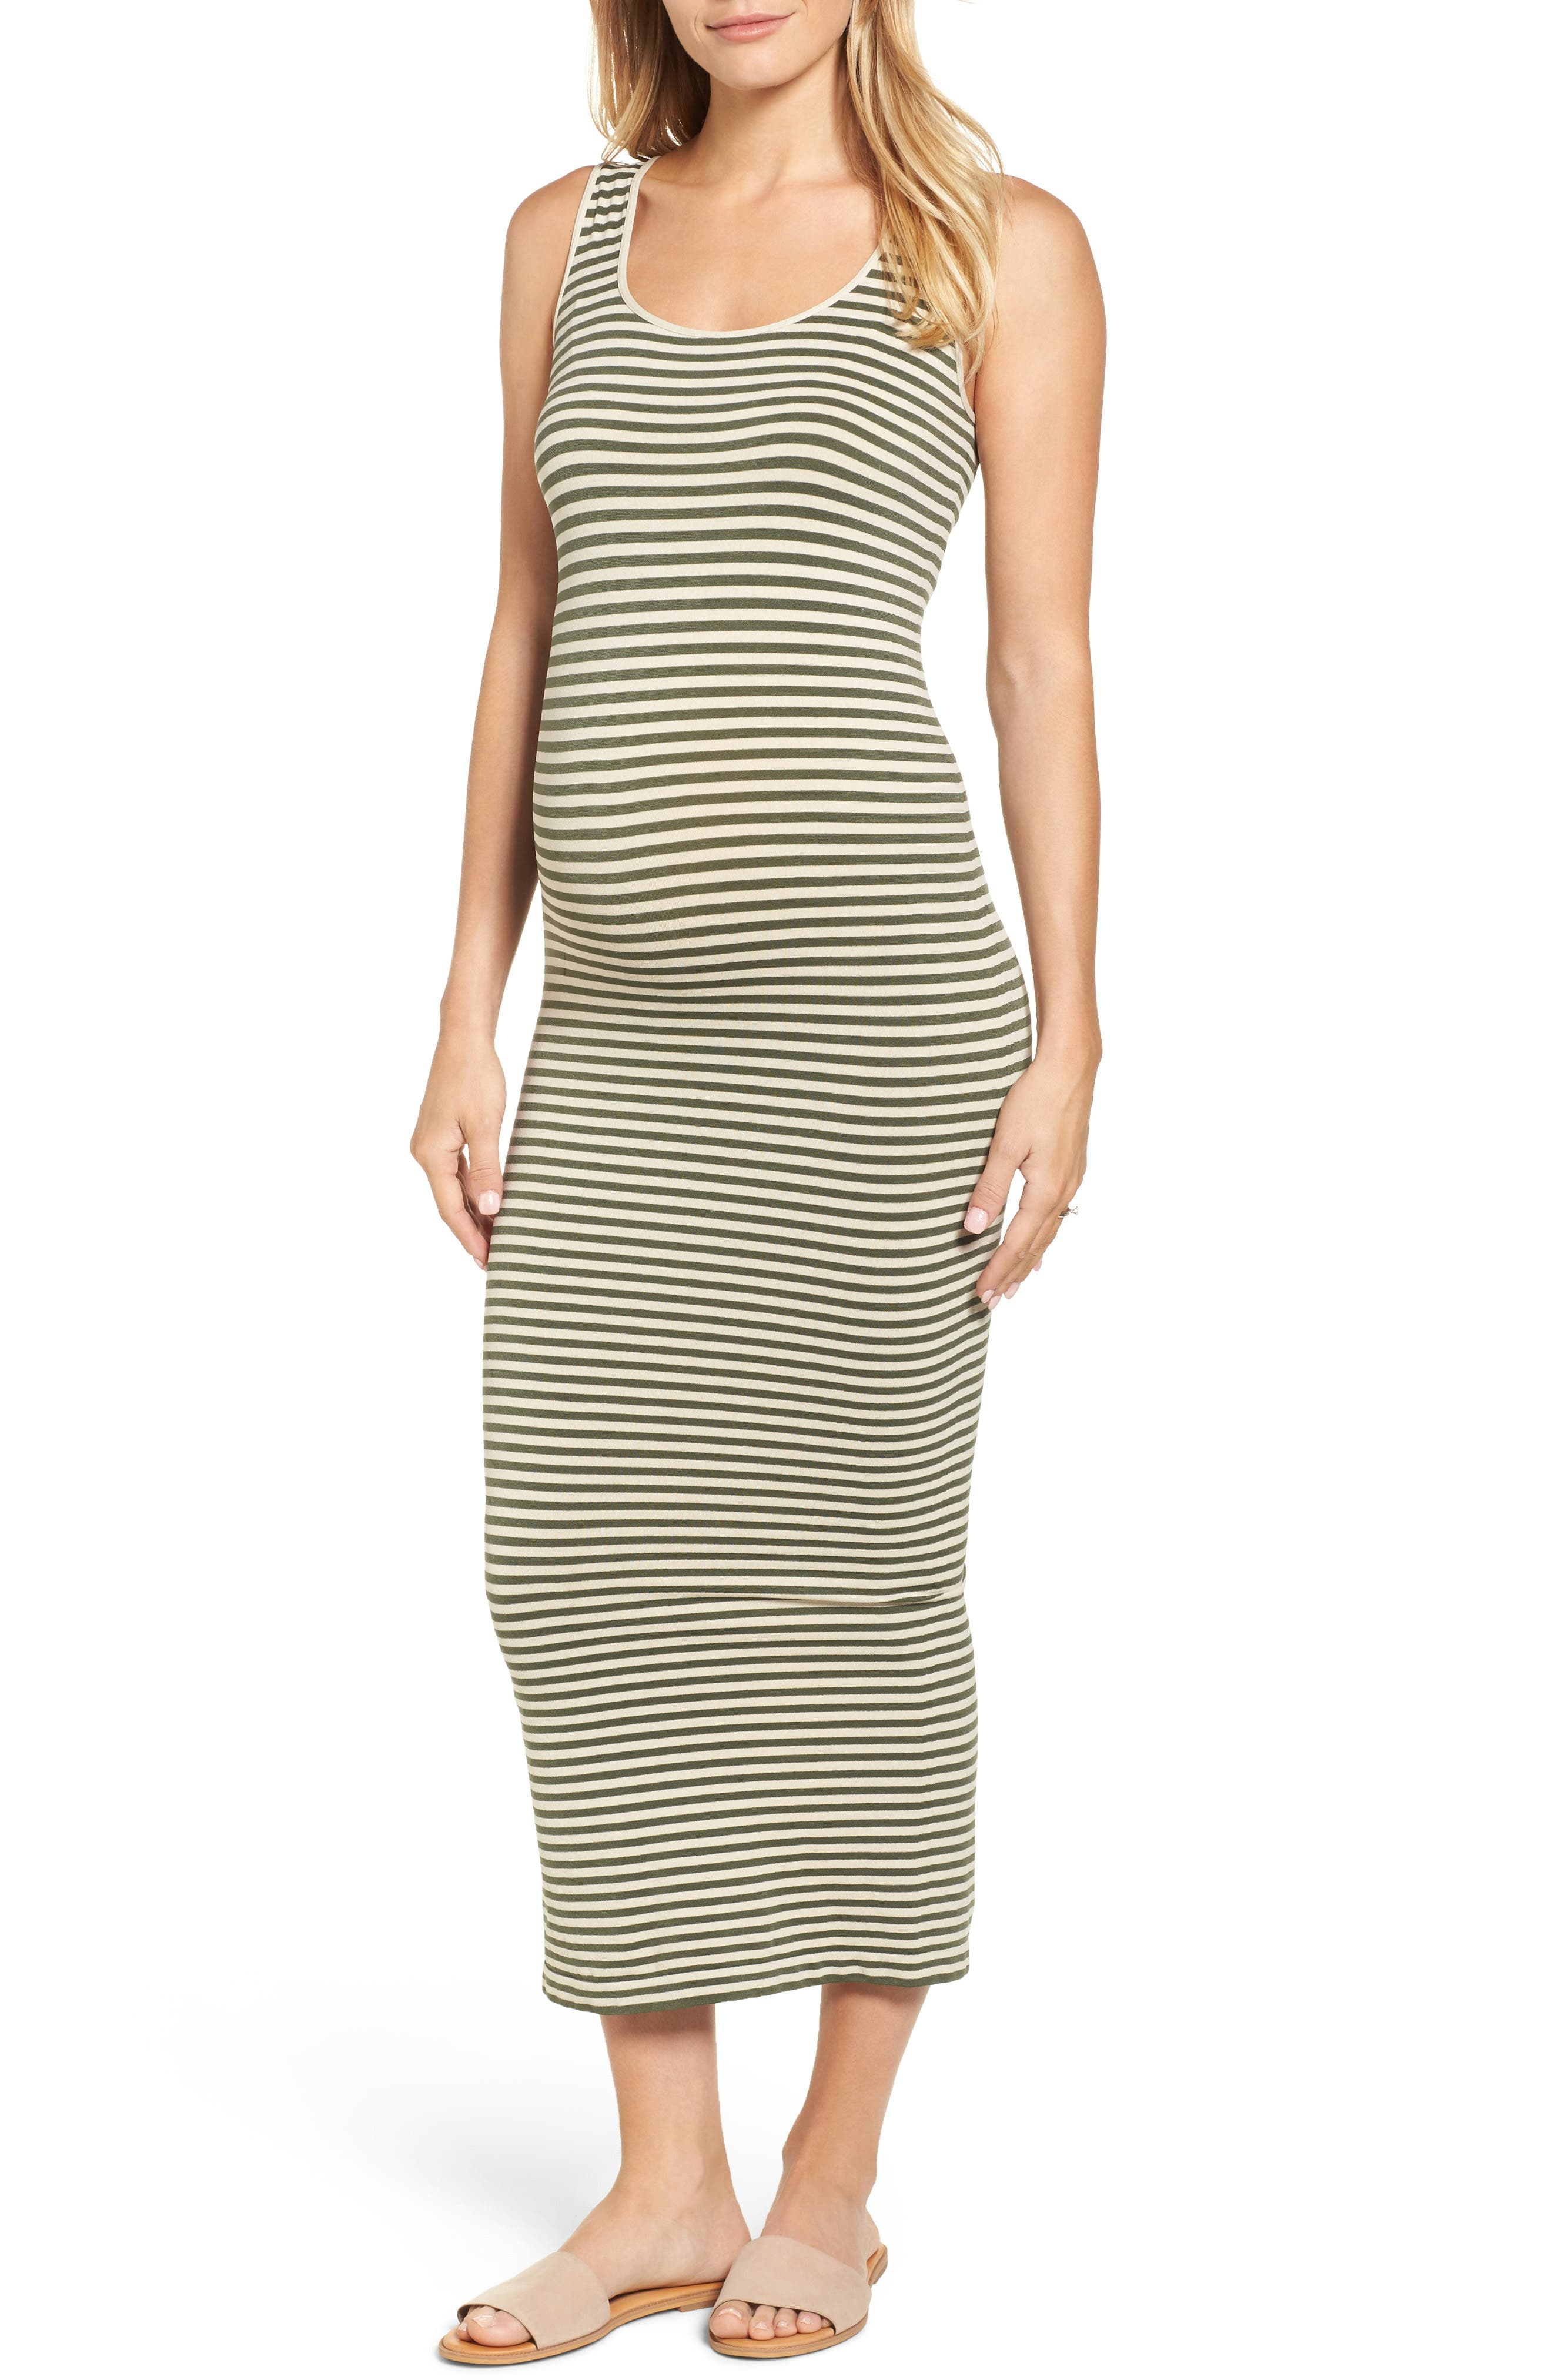 Micro Stripe Maternity Dress,                         Main,                         color, 300